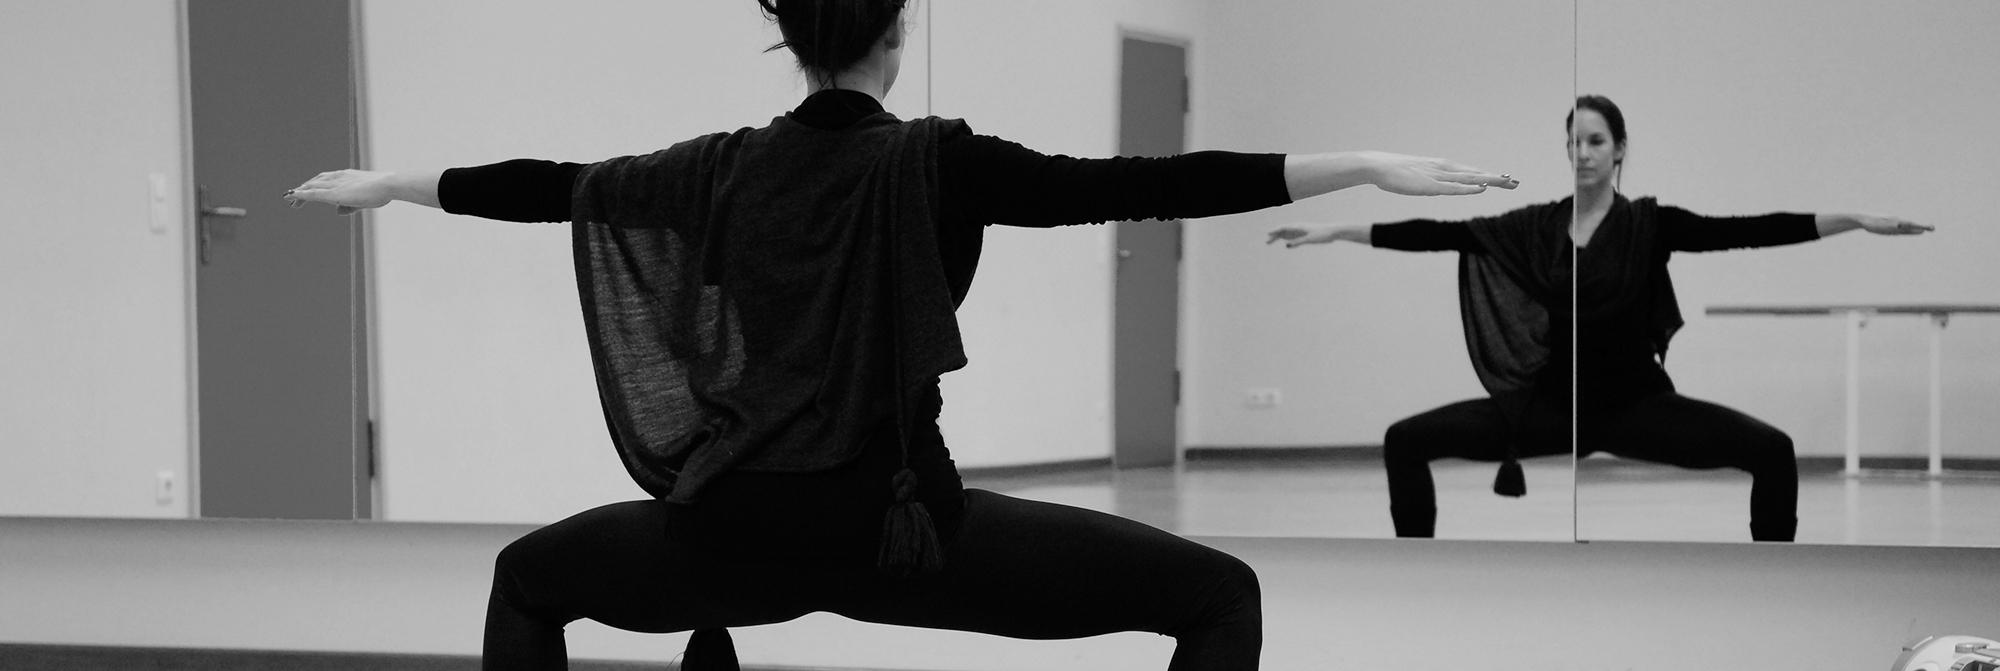 Studio-Elodie-Murnau-Port-de-bras-3